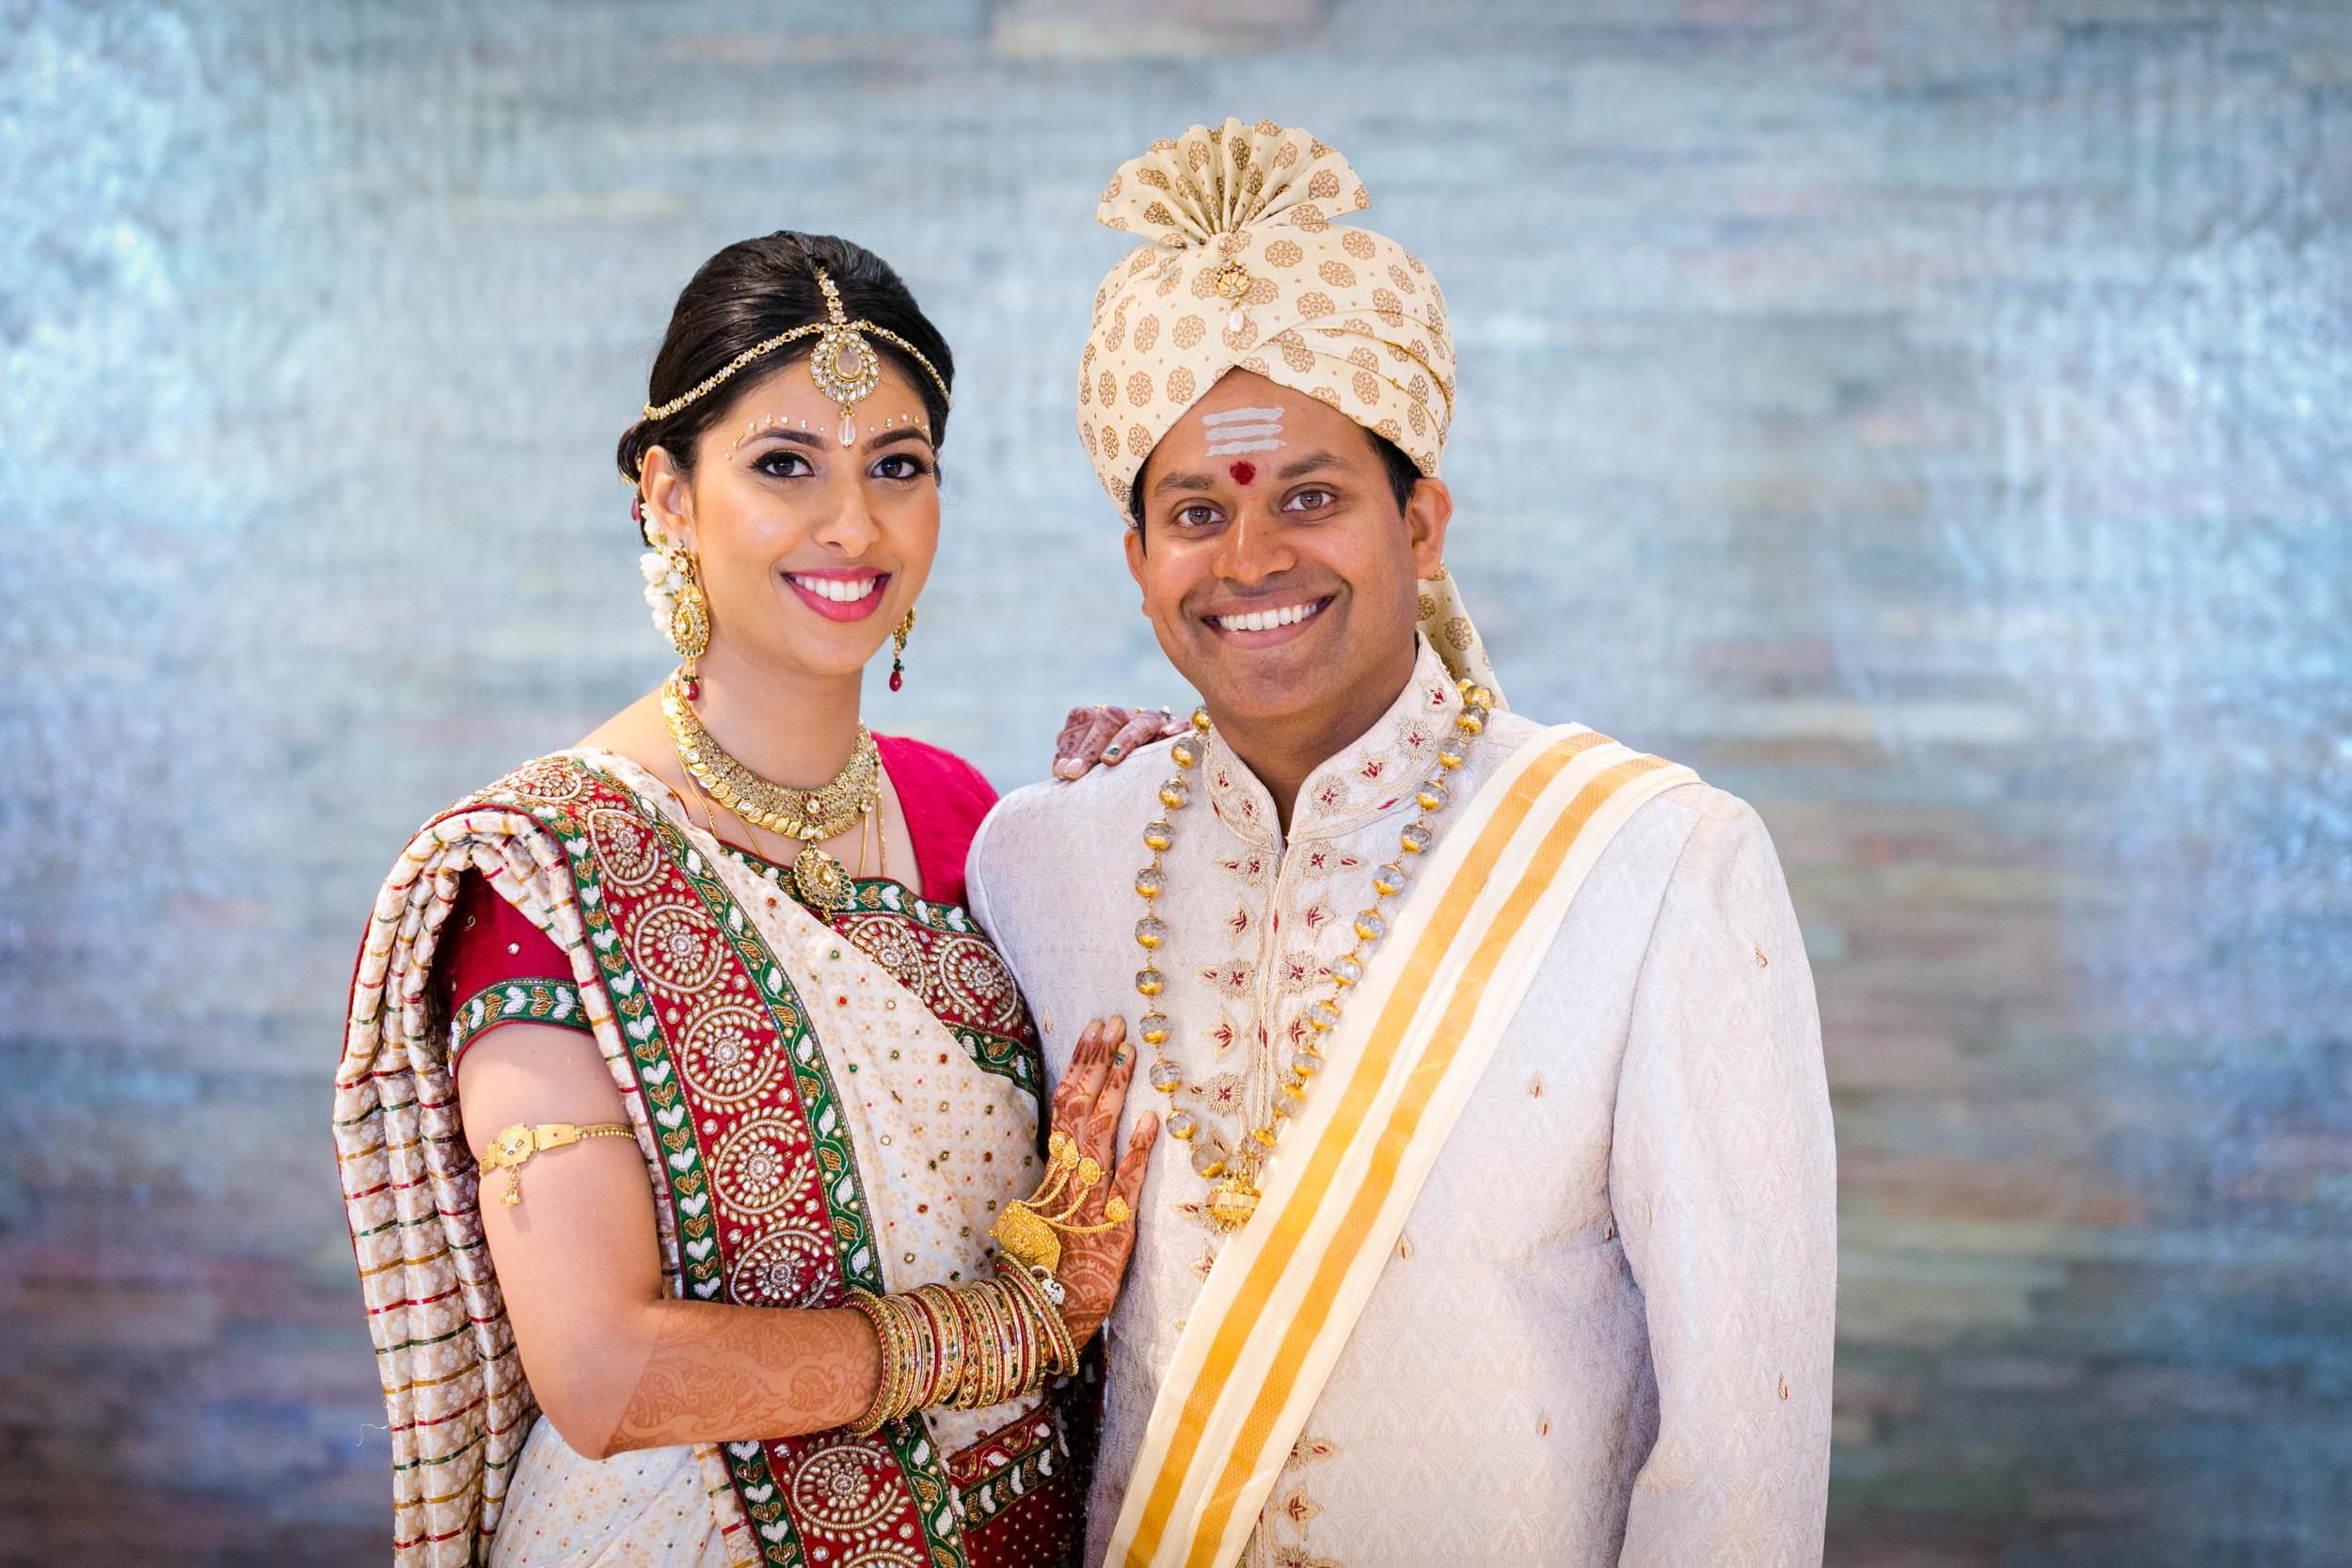 Luxurious-Indian-Wedding-Marriott-Boston-Massachusetts-Documentary-Wedding-Photography-by-Jacek-Dolata-9.jpg